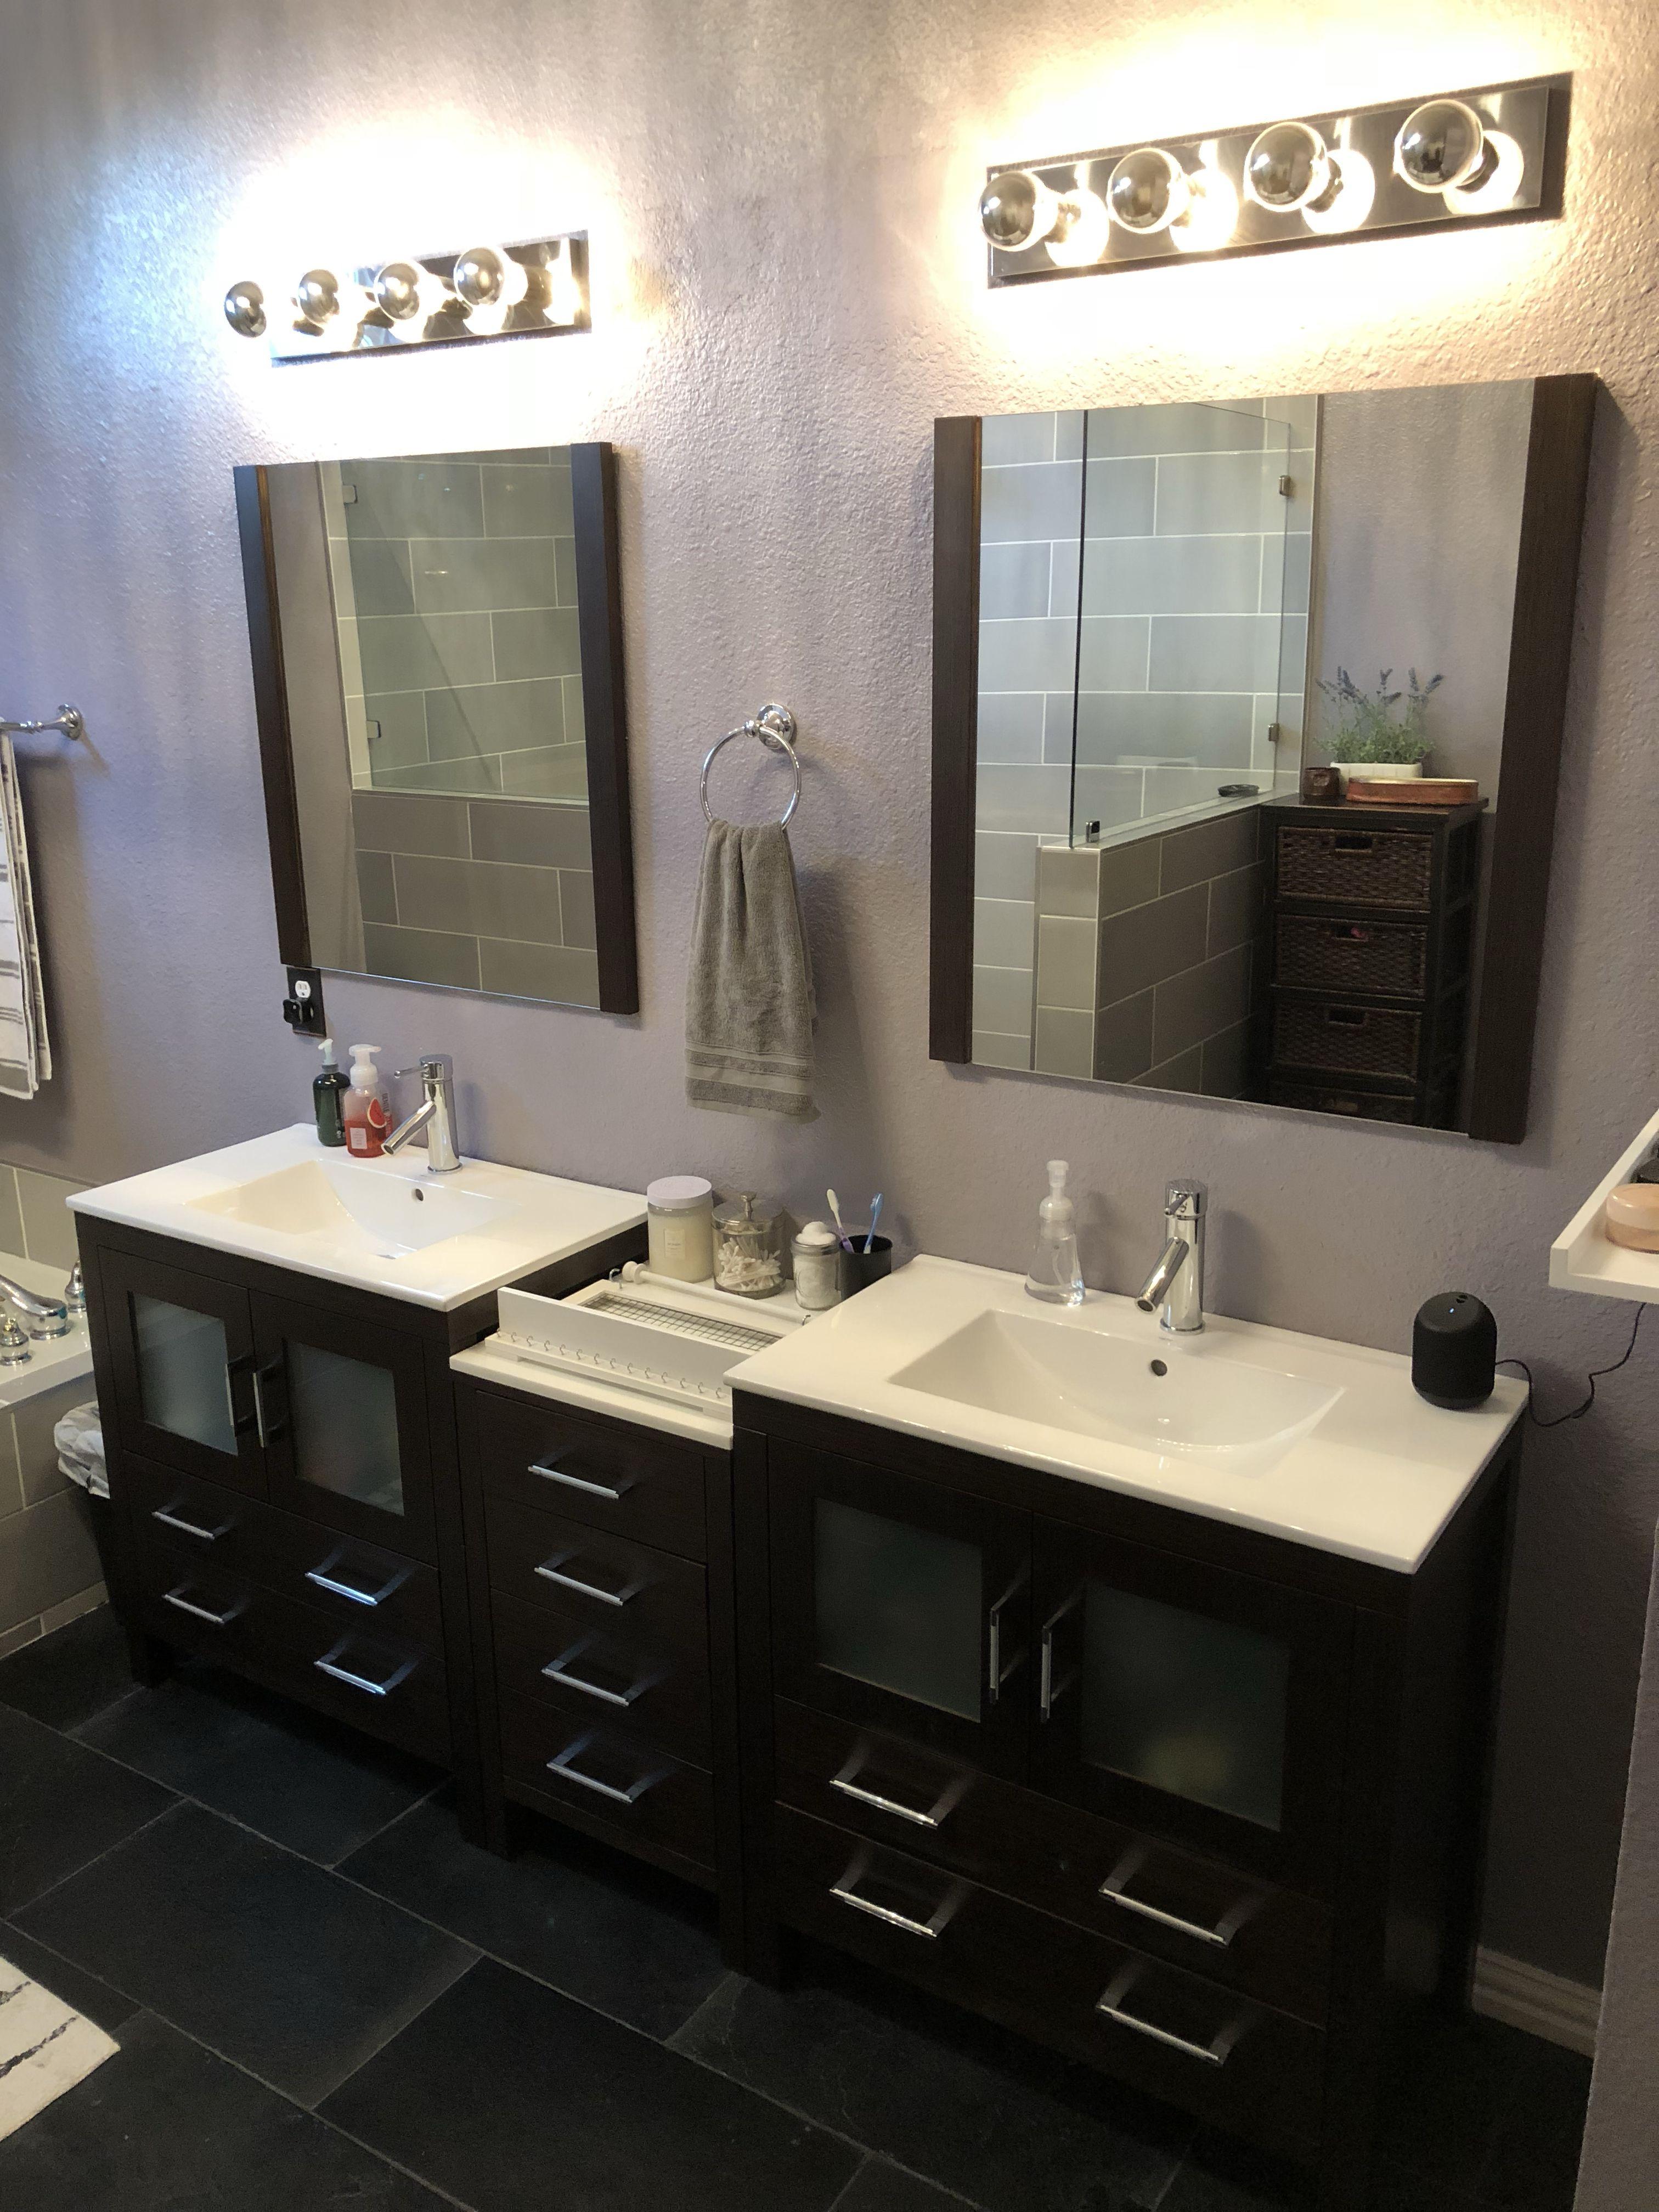 Double Sink Vanity Bathroom Cabinet Colors Bathroom Colors Bathroom Remodel Master [ 4032 x 3024 Pixel ]